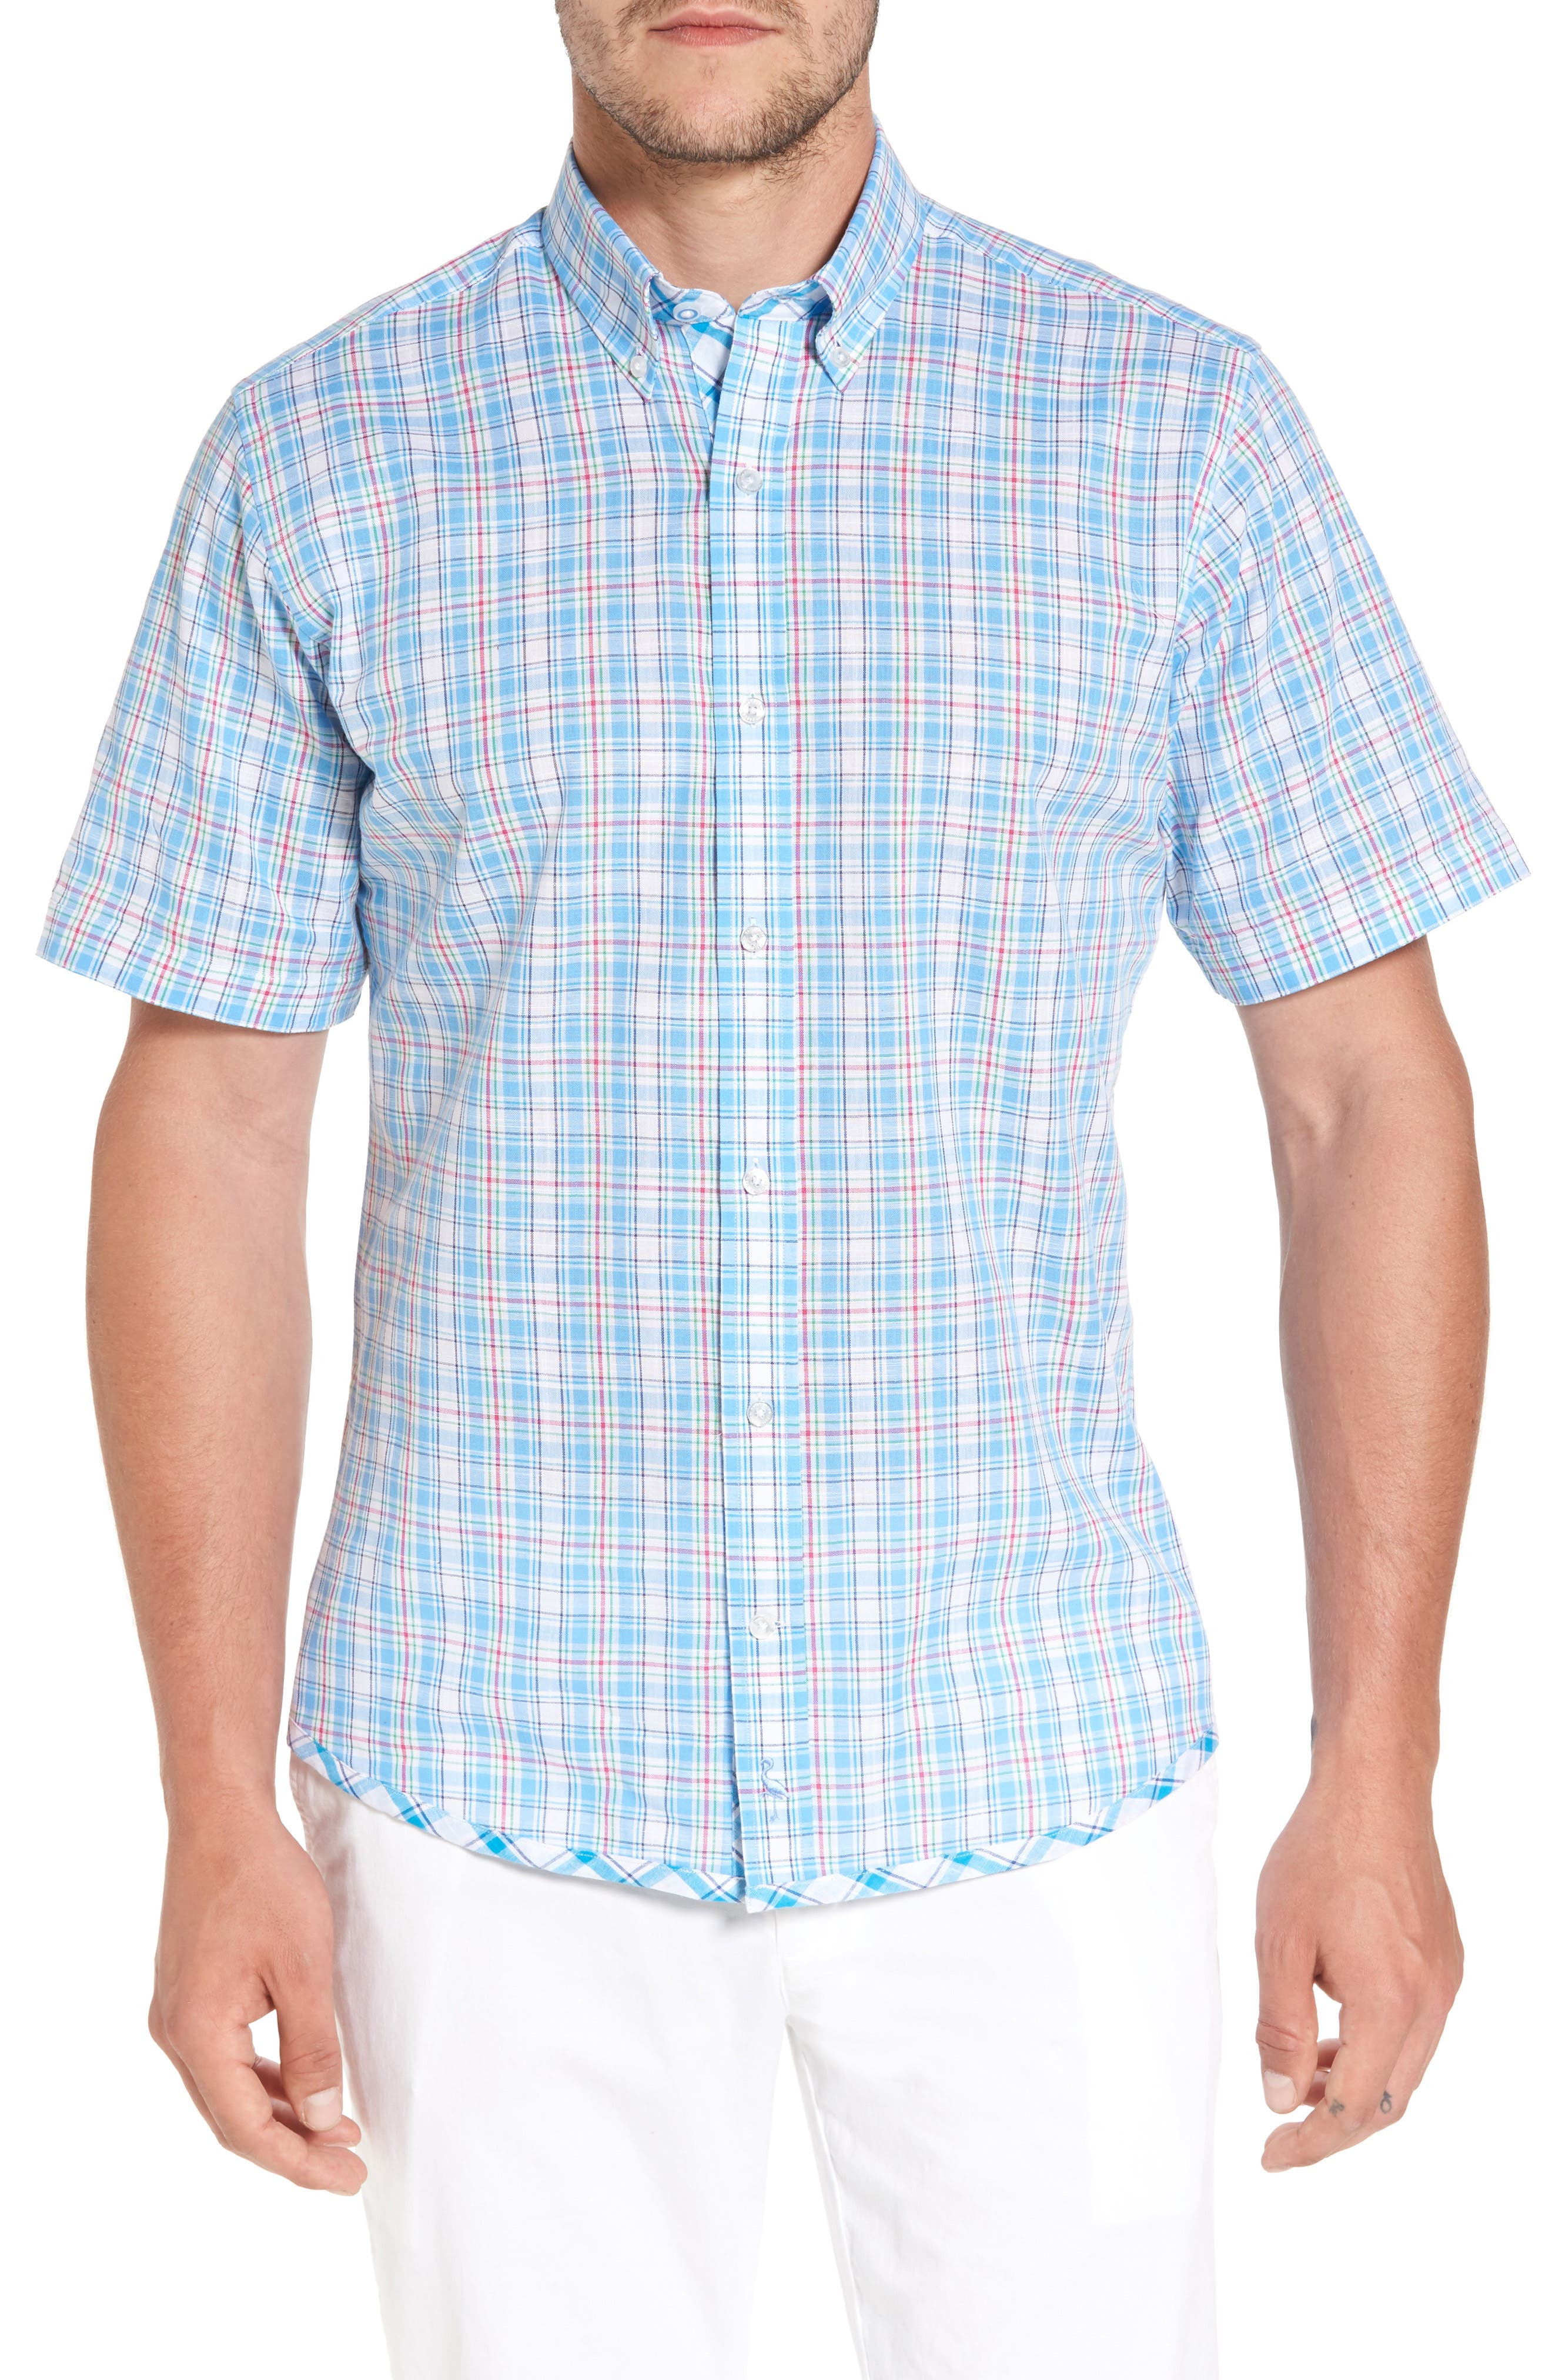 Nectarine Sport Shirt,                             Main thumbnail 1, color,